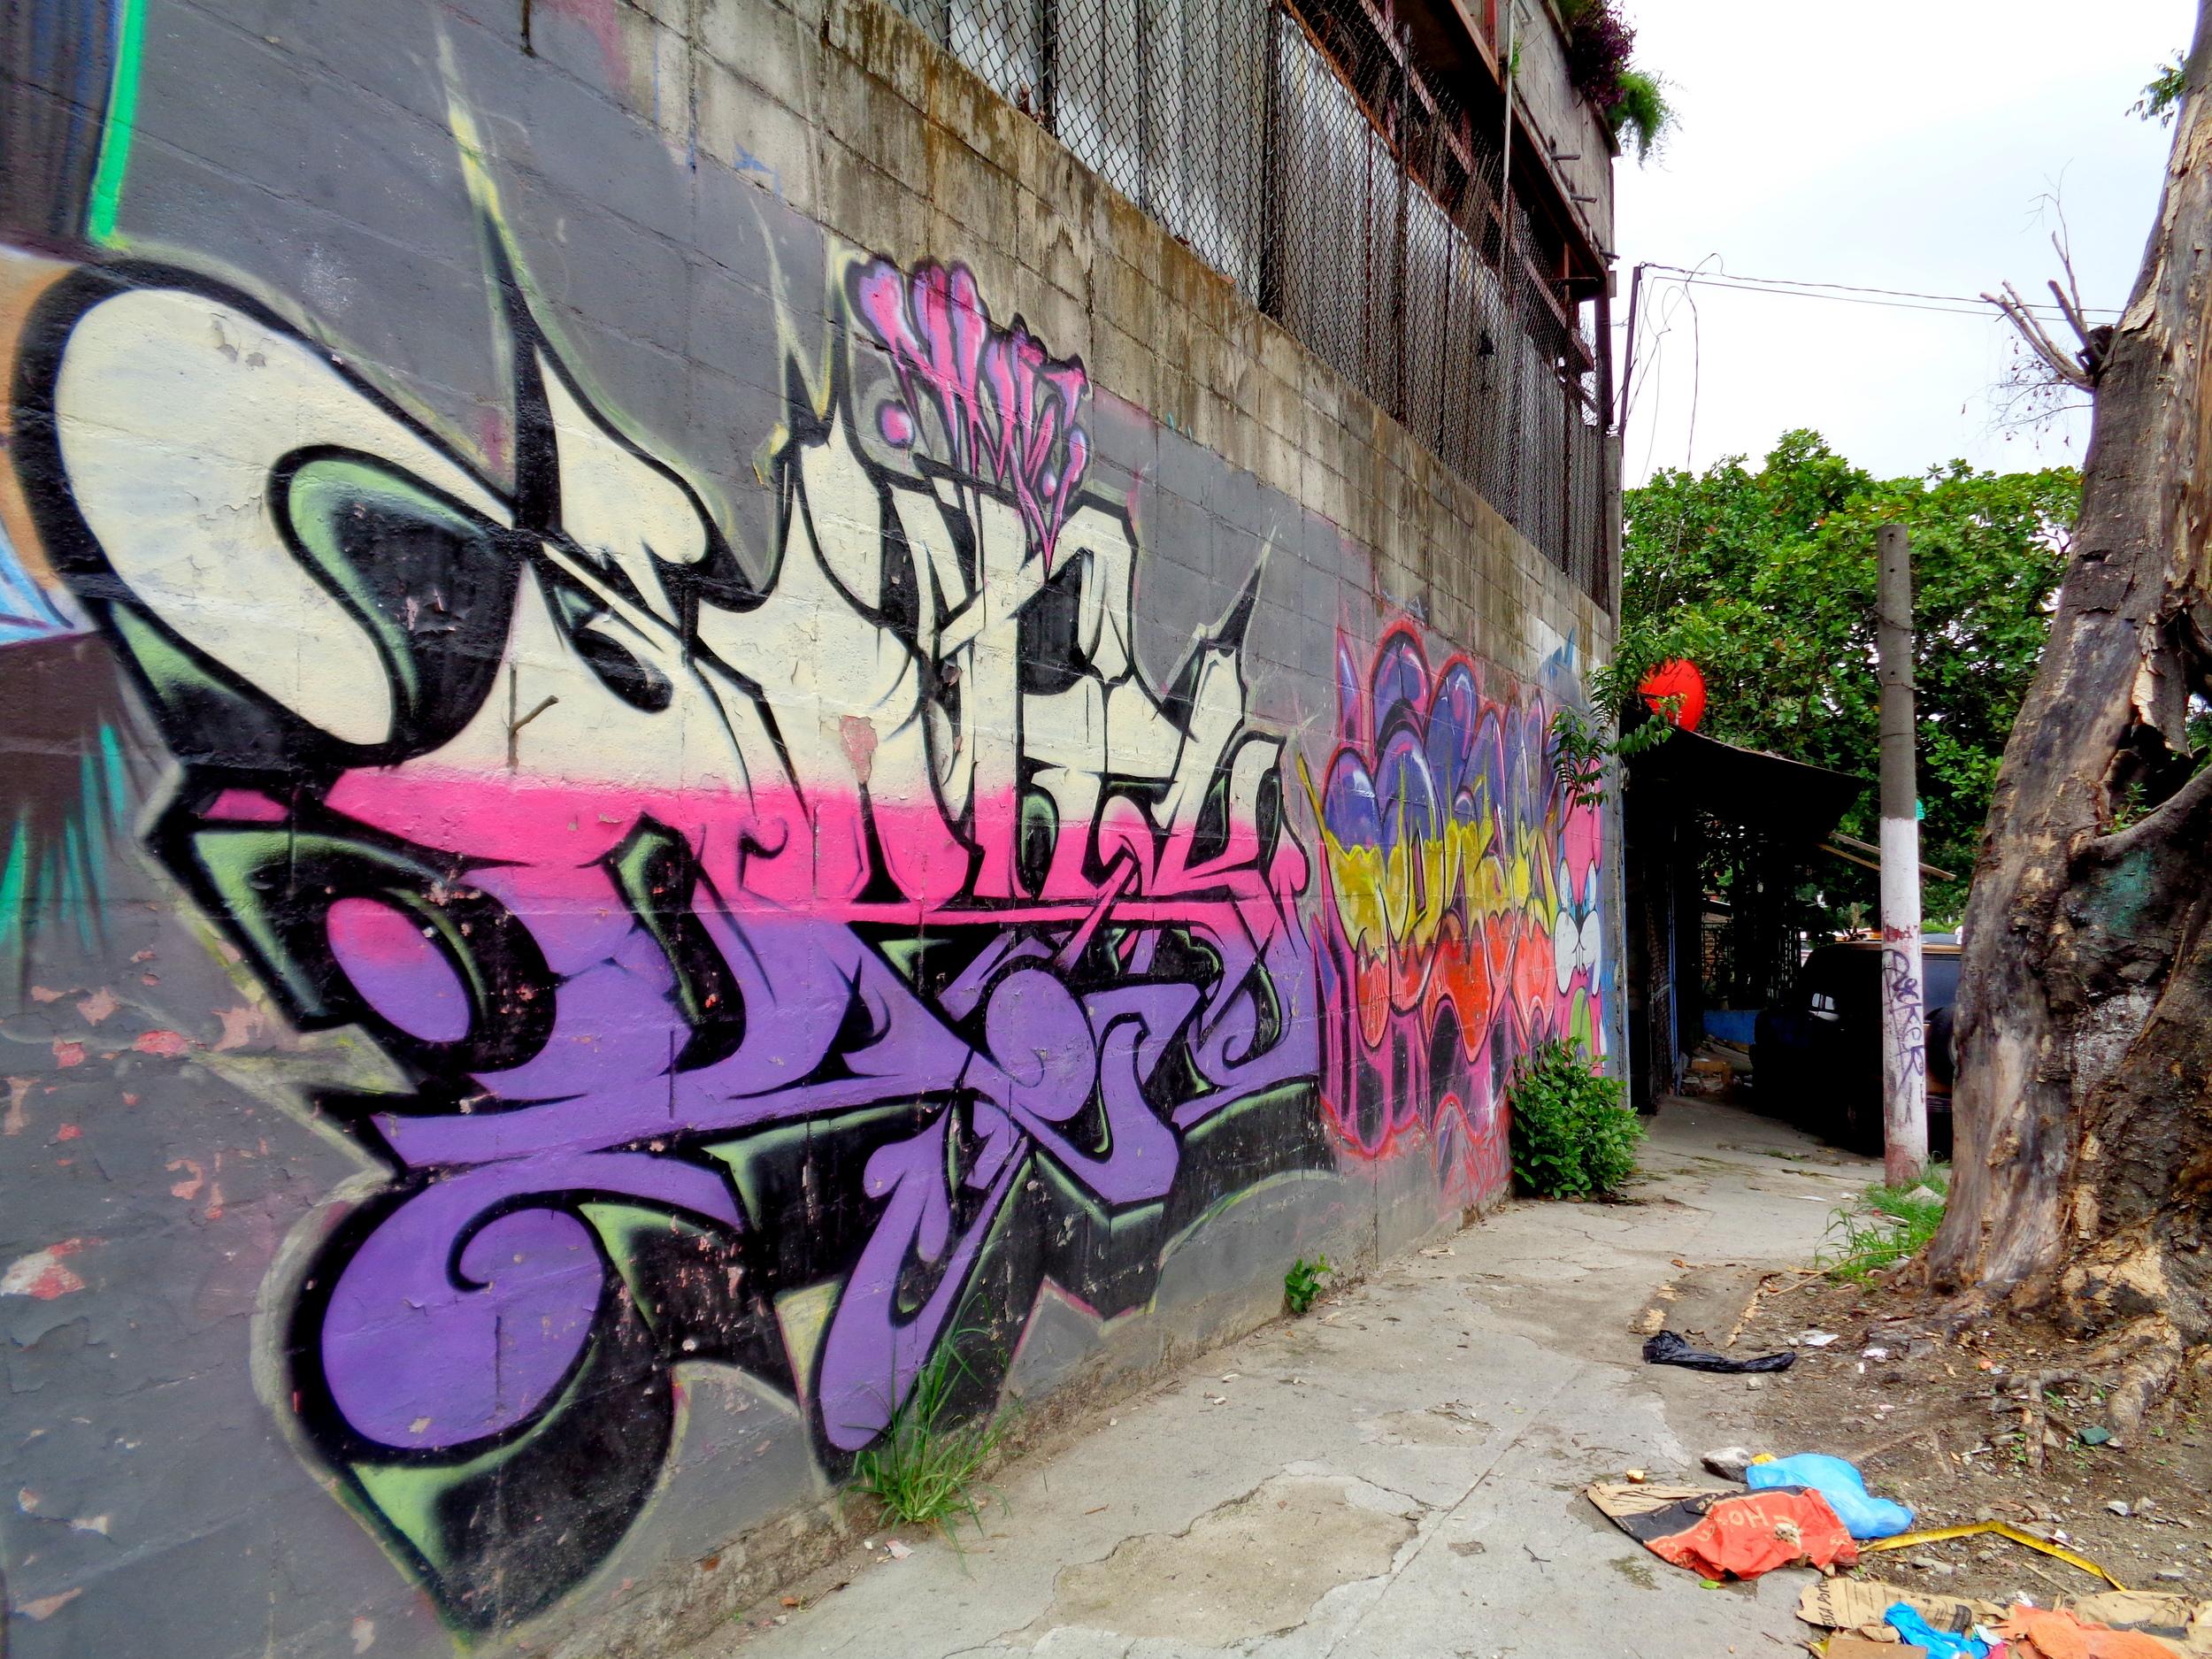 Graffiti in San Salvador's Mejicanos neighborhood.